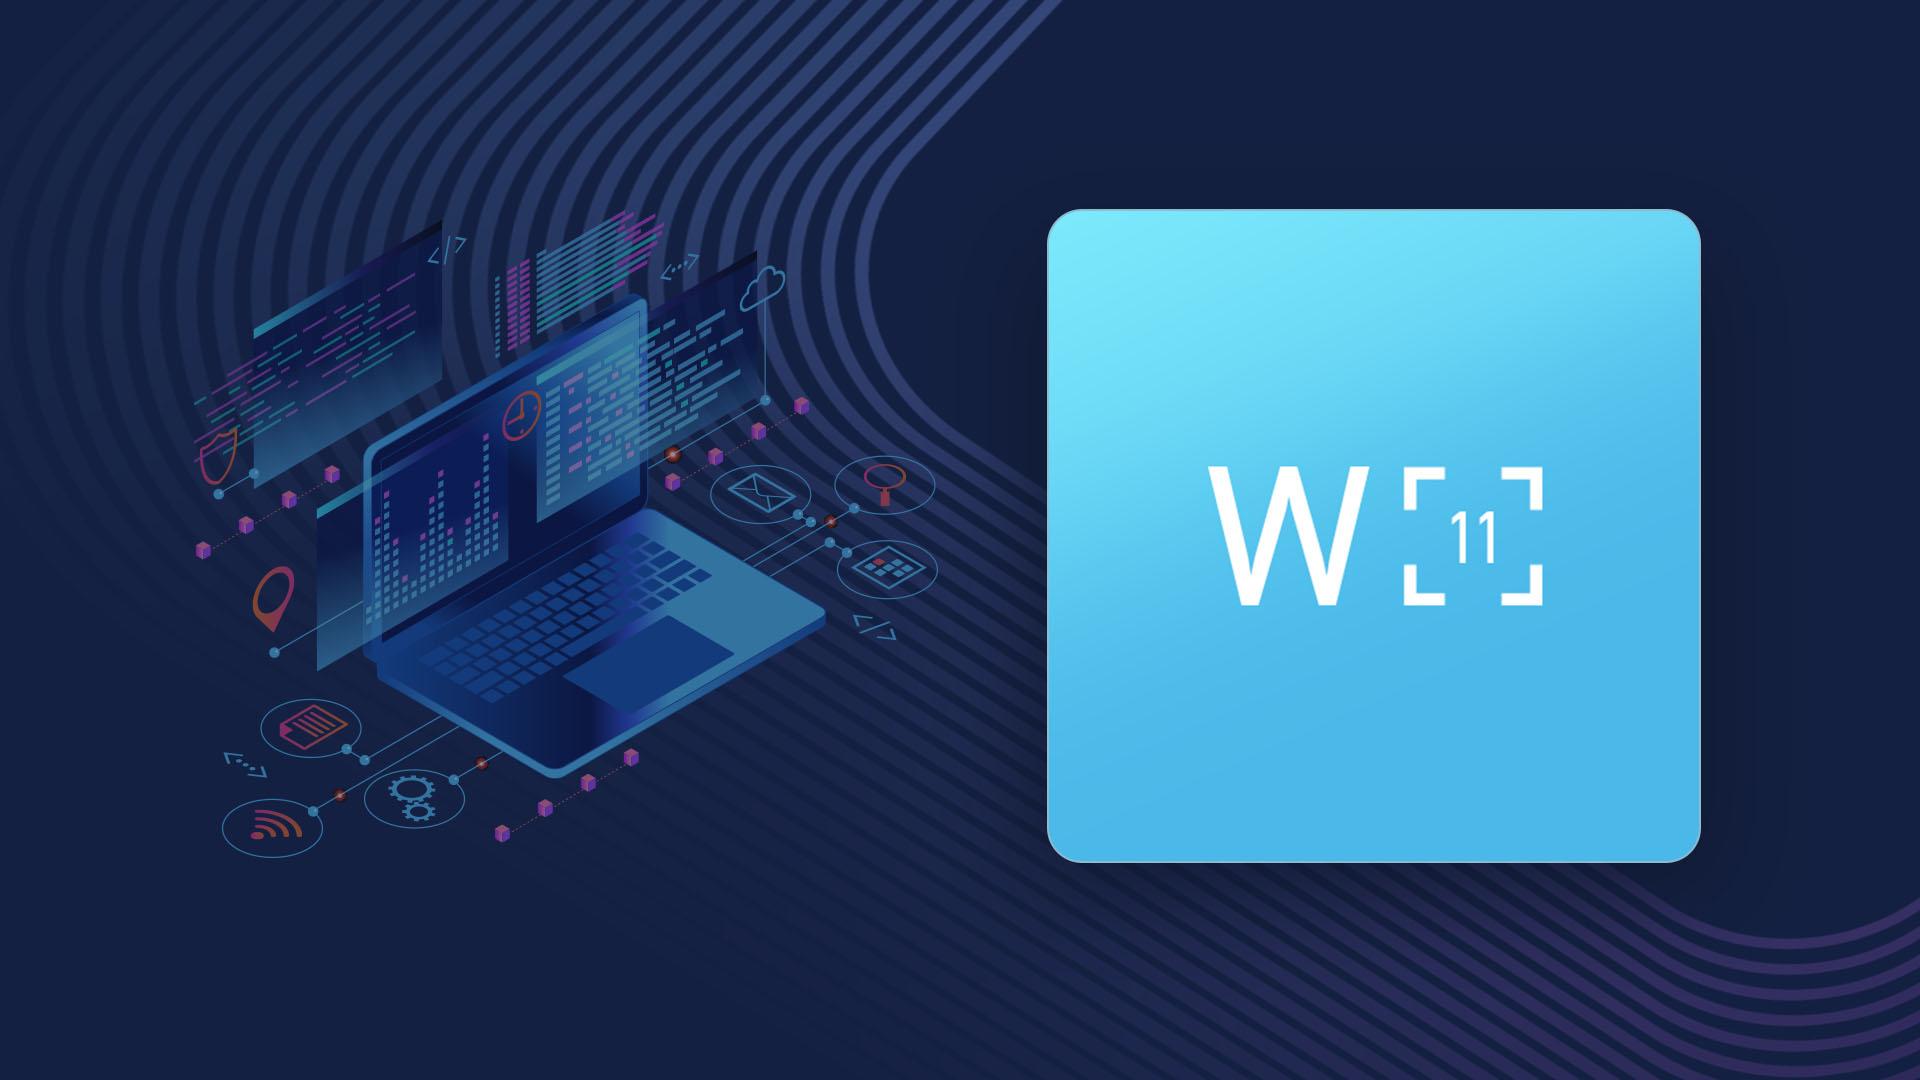 Windows 11 blog